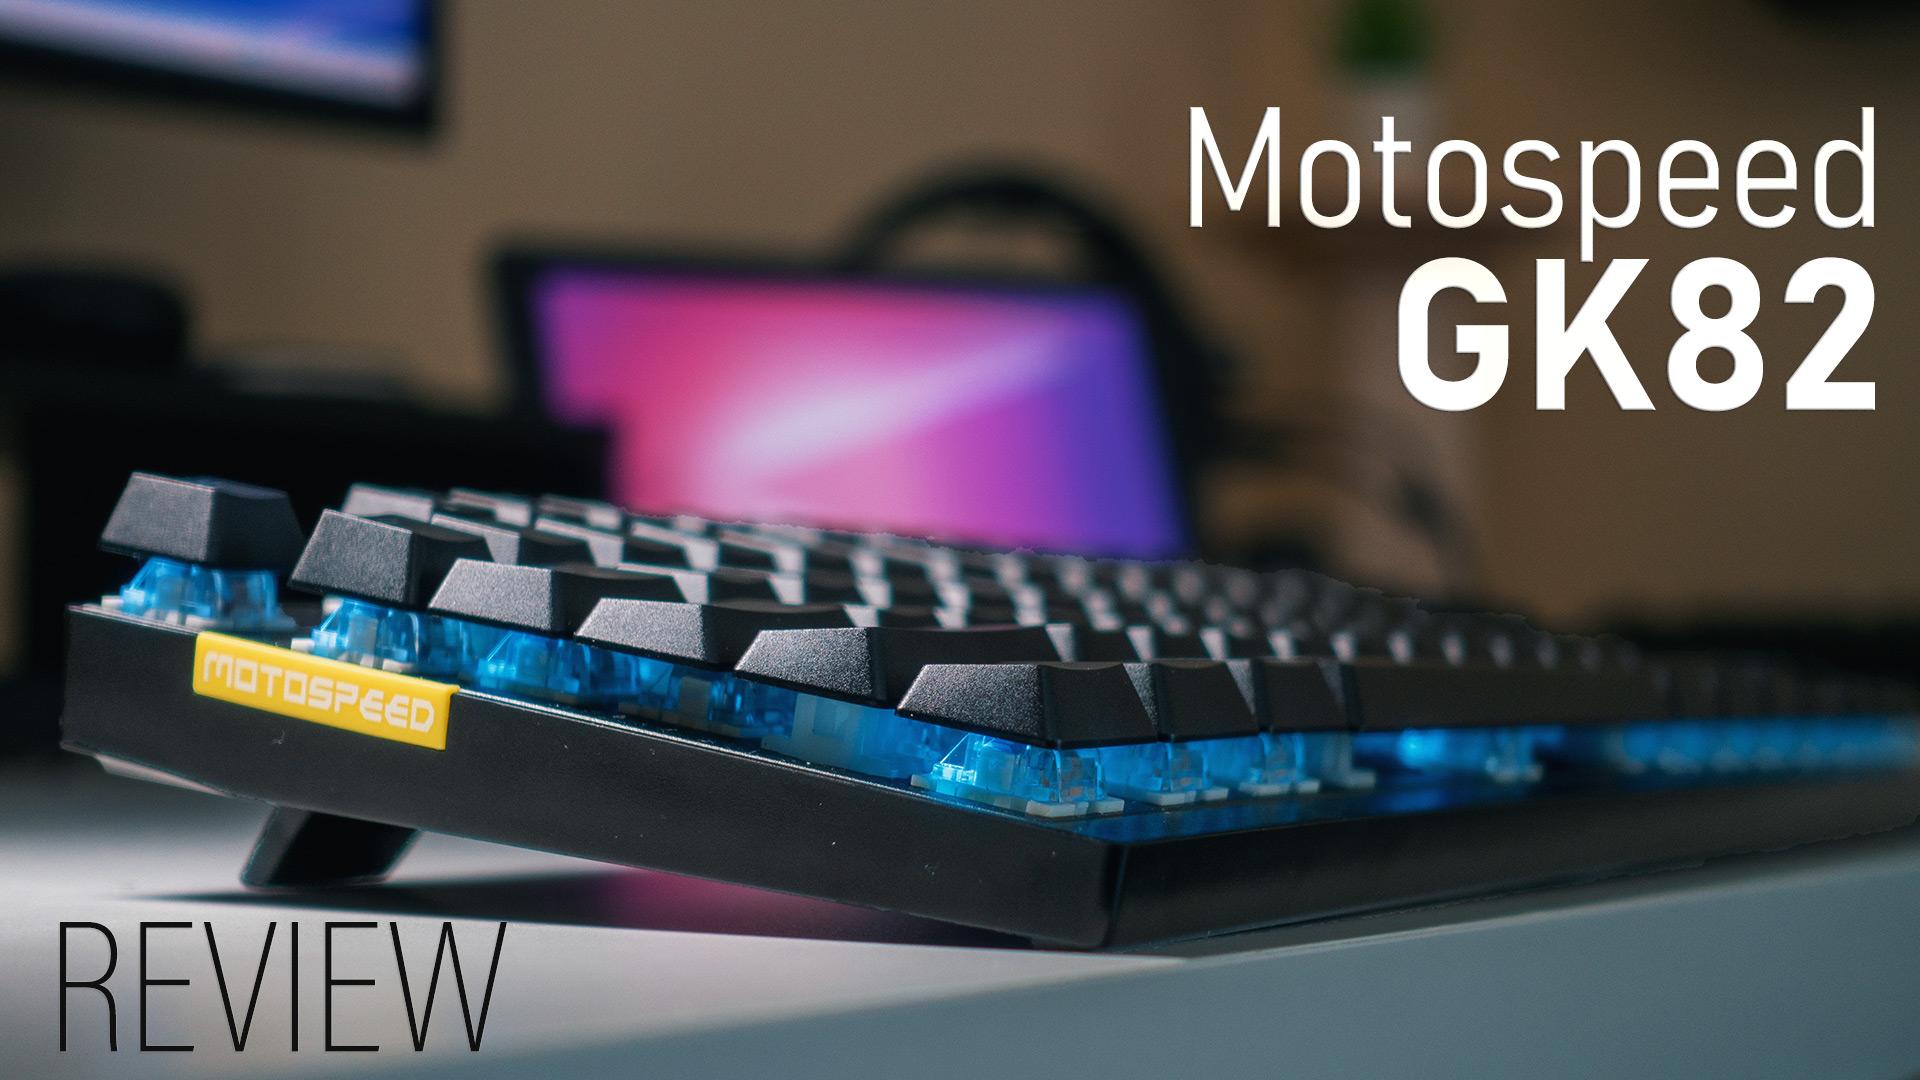 Motospeed GK82 - Hero image